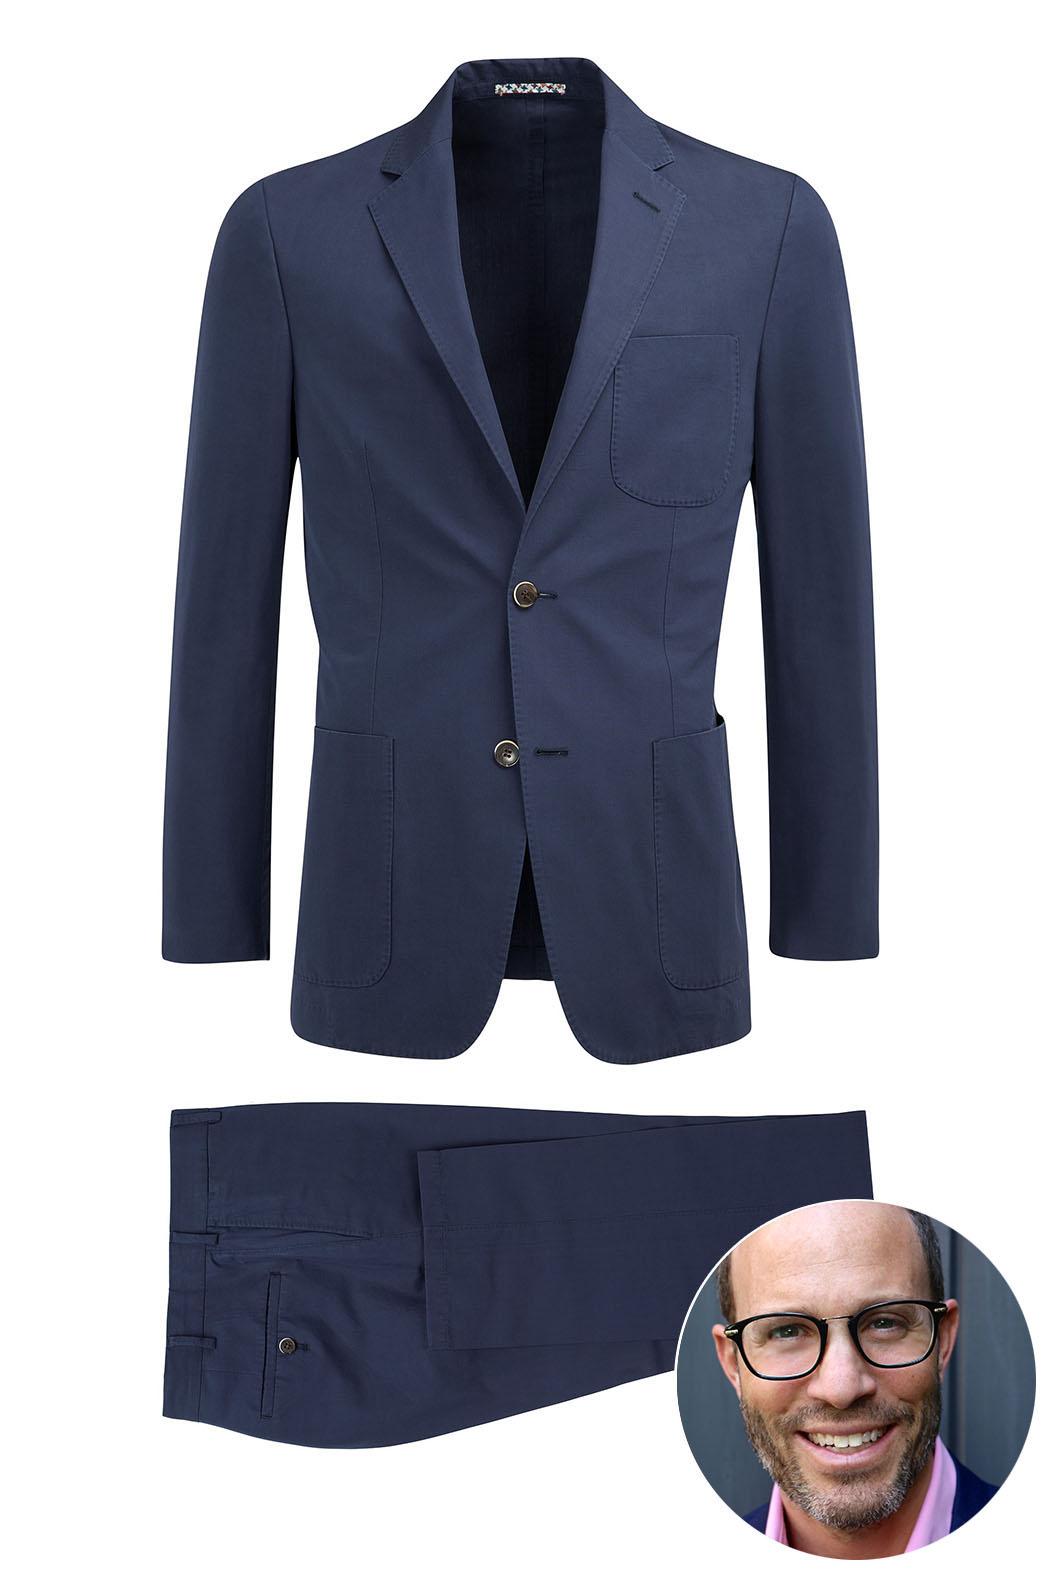 Suit Supply Andrew Weitz Inset - P 2015